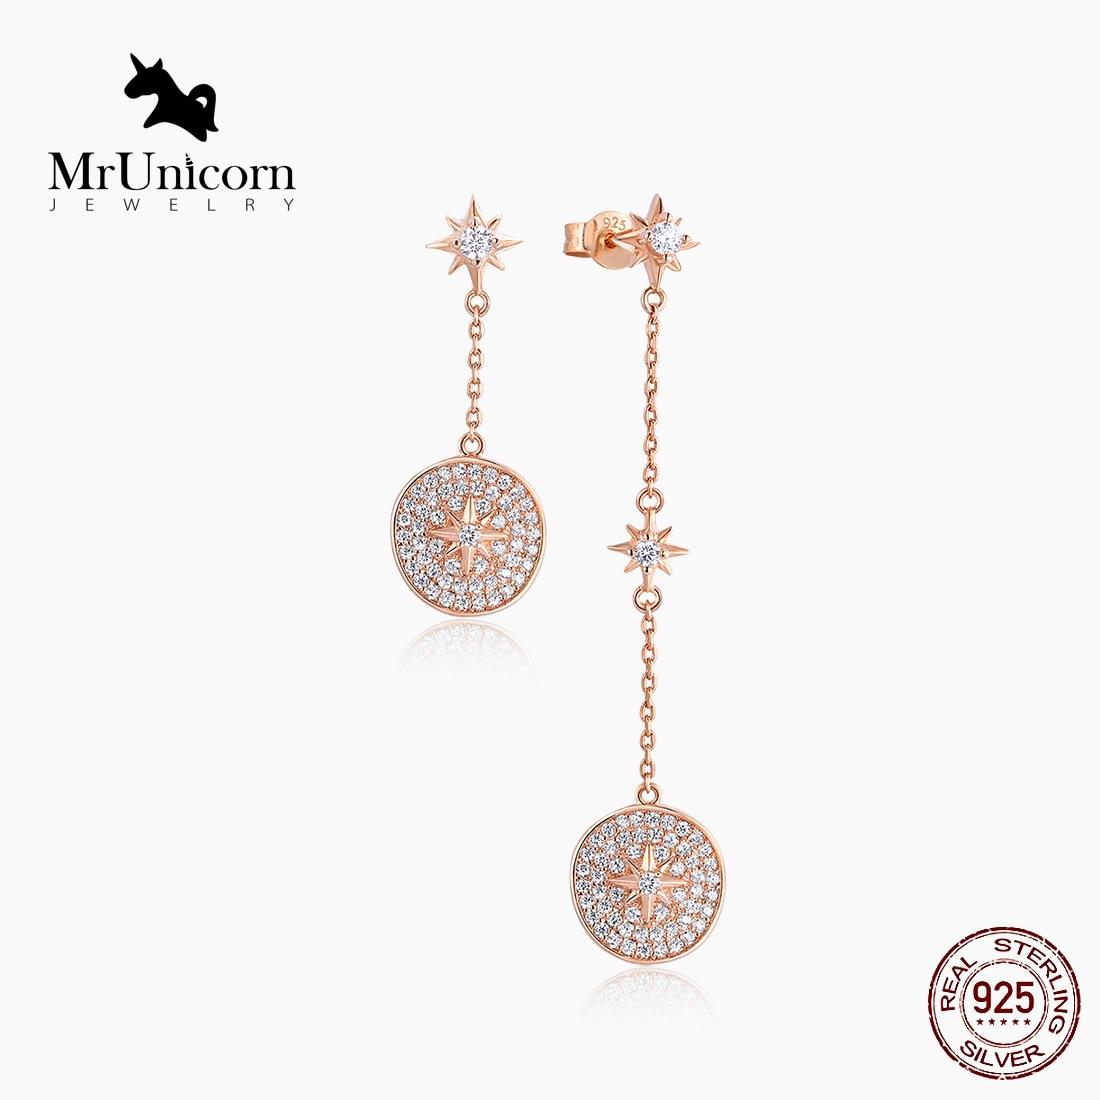 MrUnicorn S925 Silver Asymmetric star stud earrings for ladies six-pointed star sterling silver earr